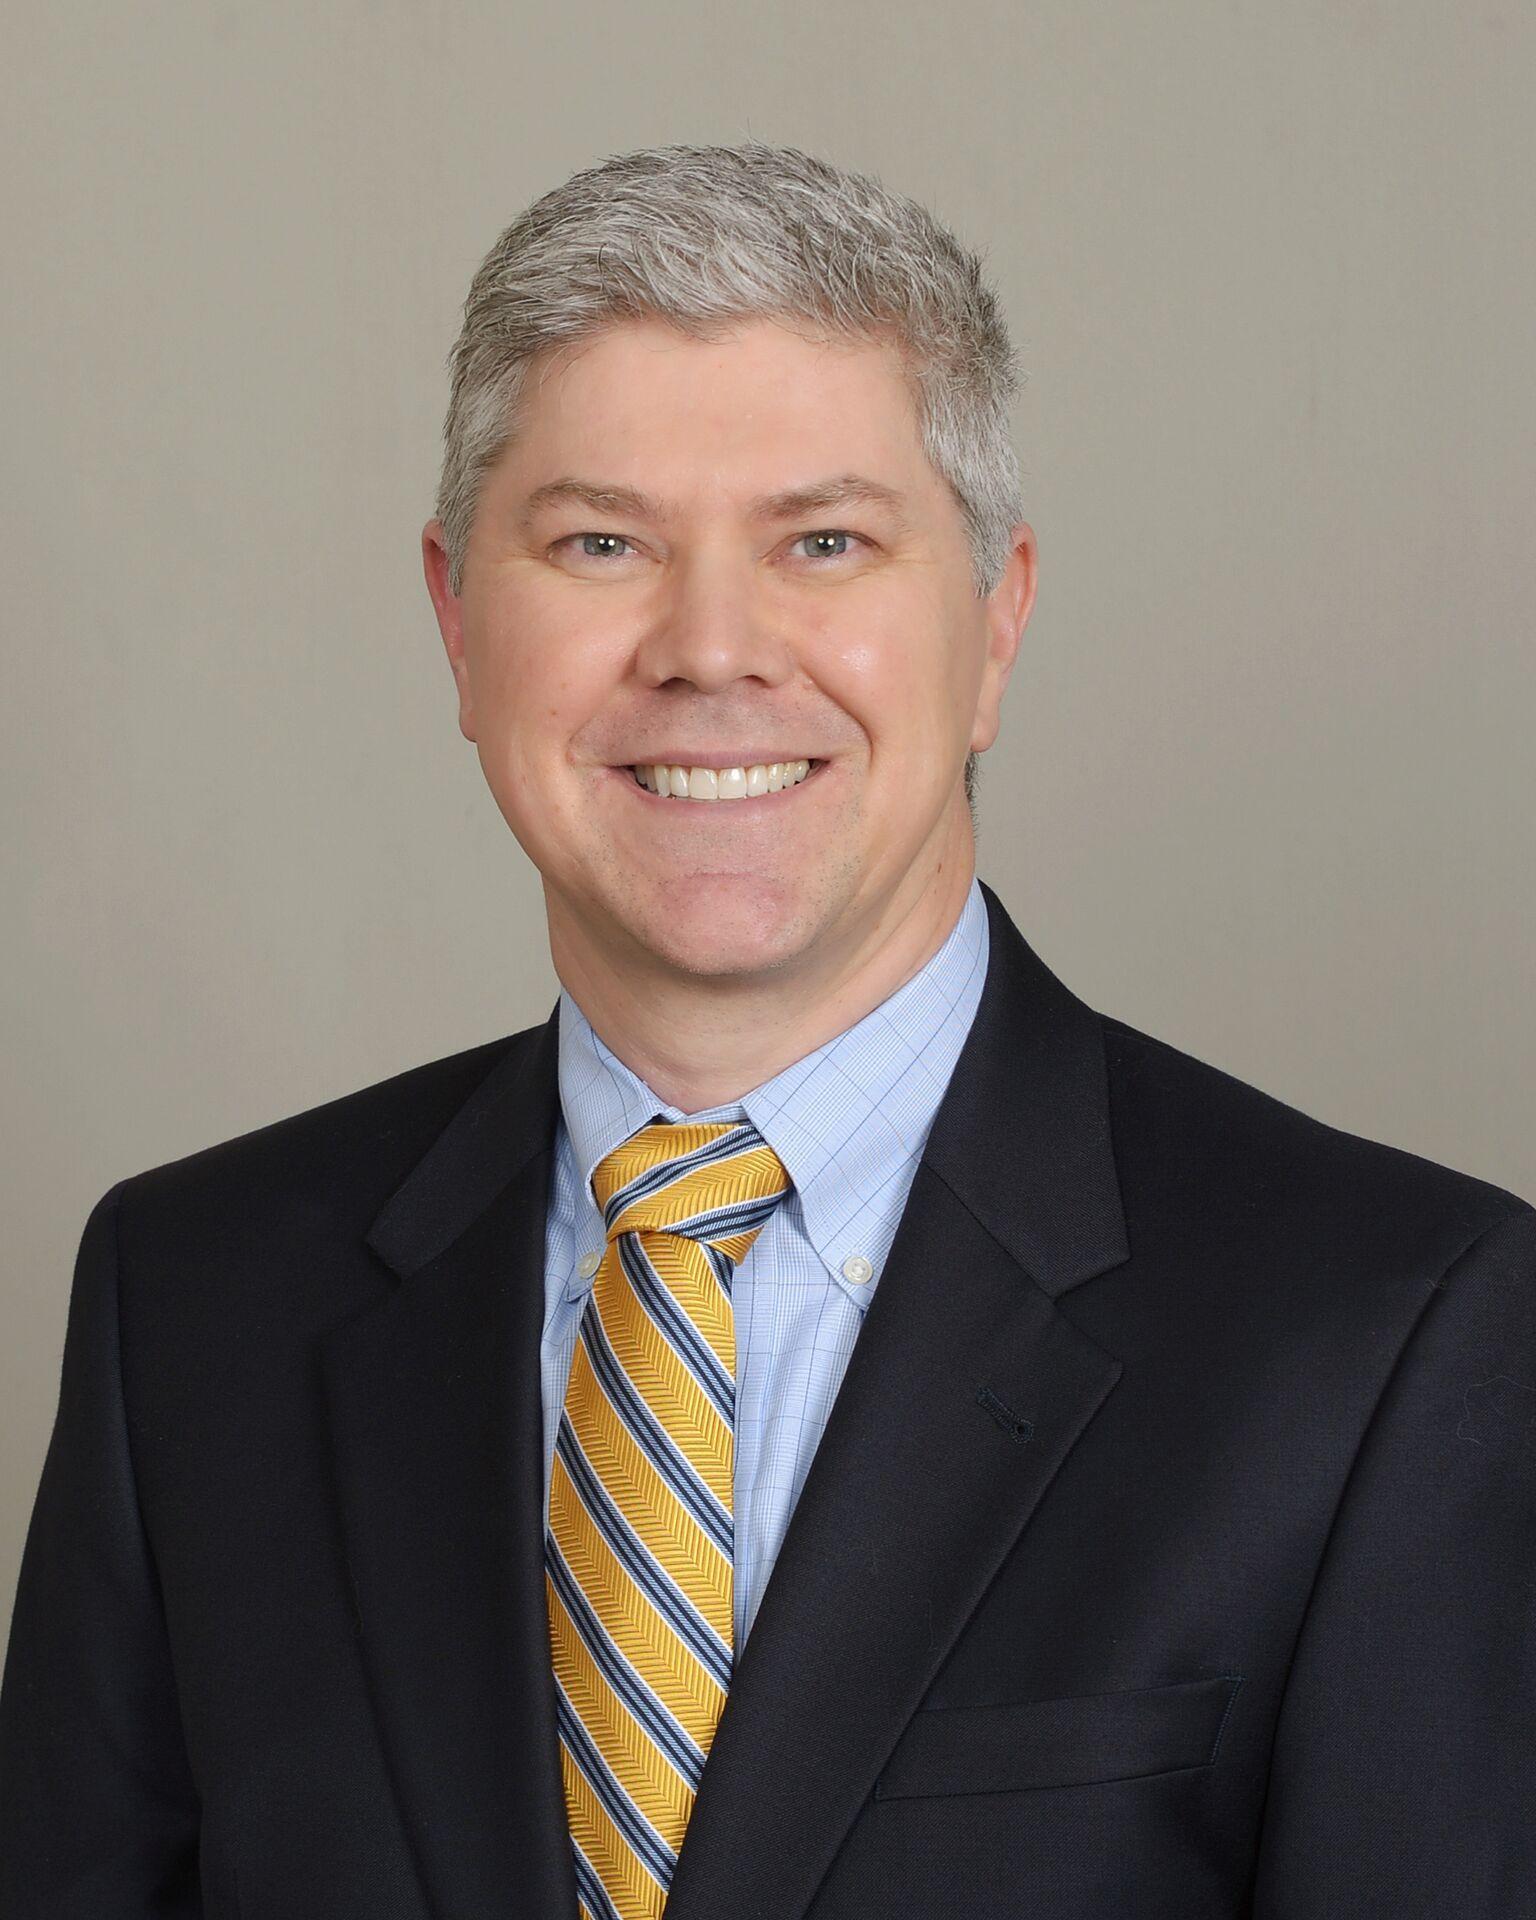 Profile Photo of Dr. Chris Cramer - None